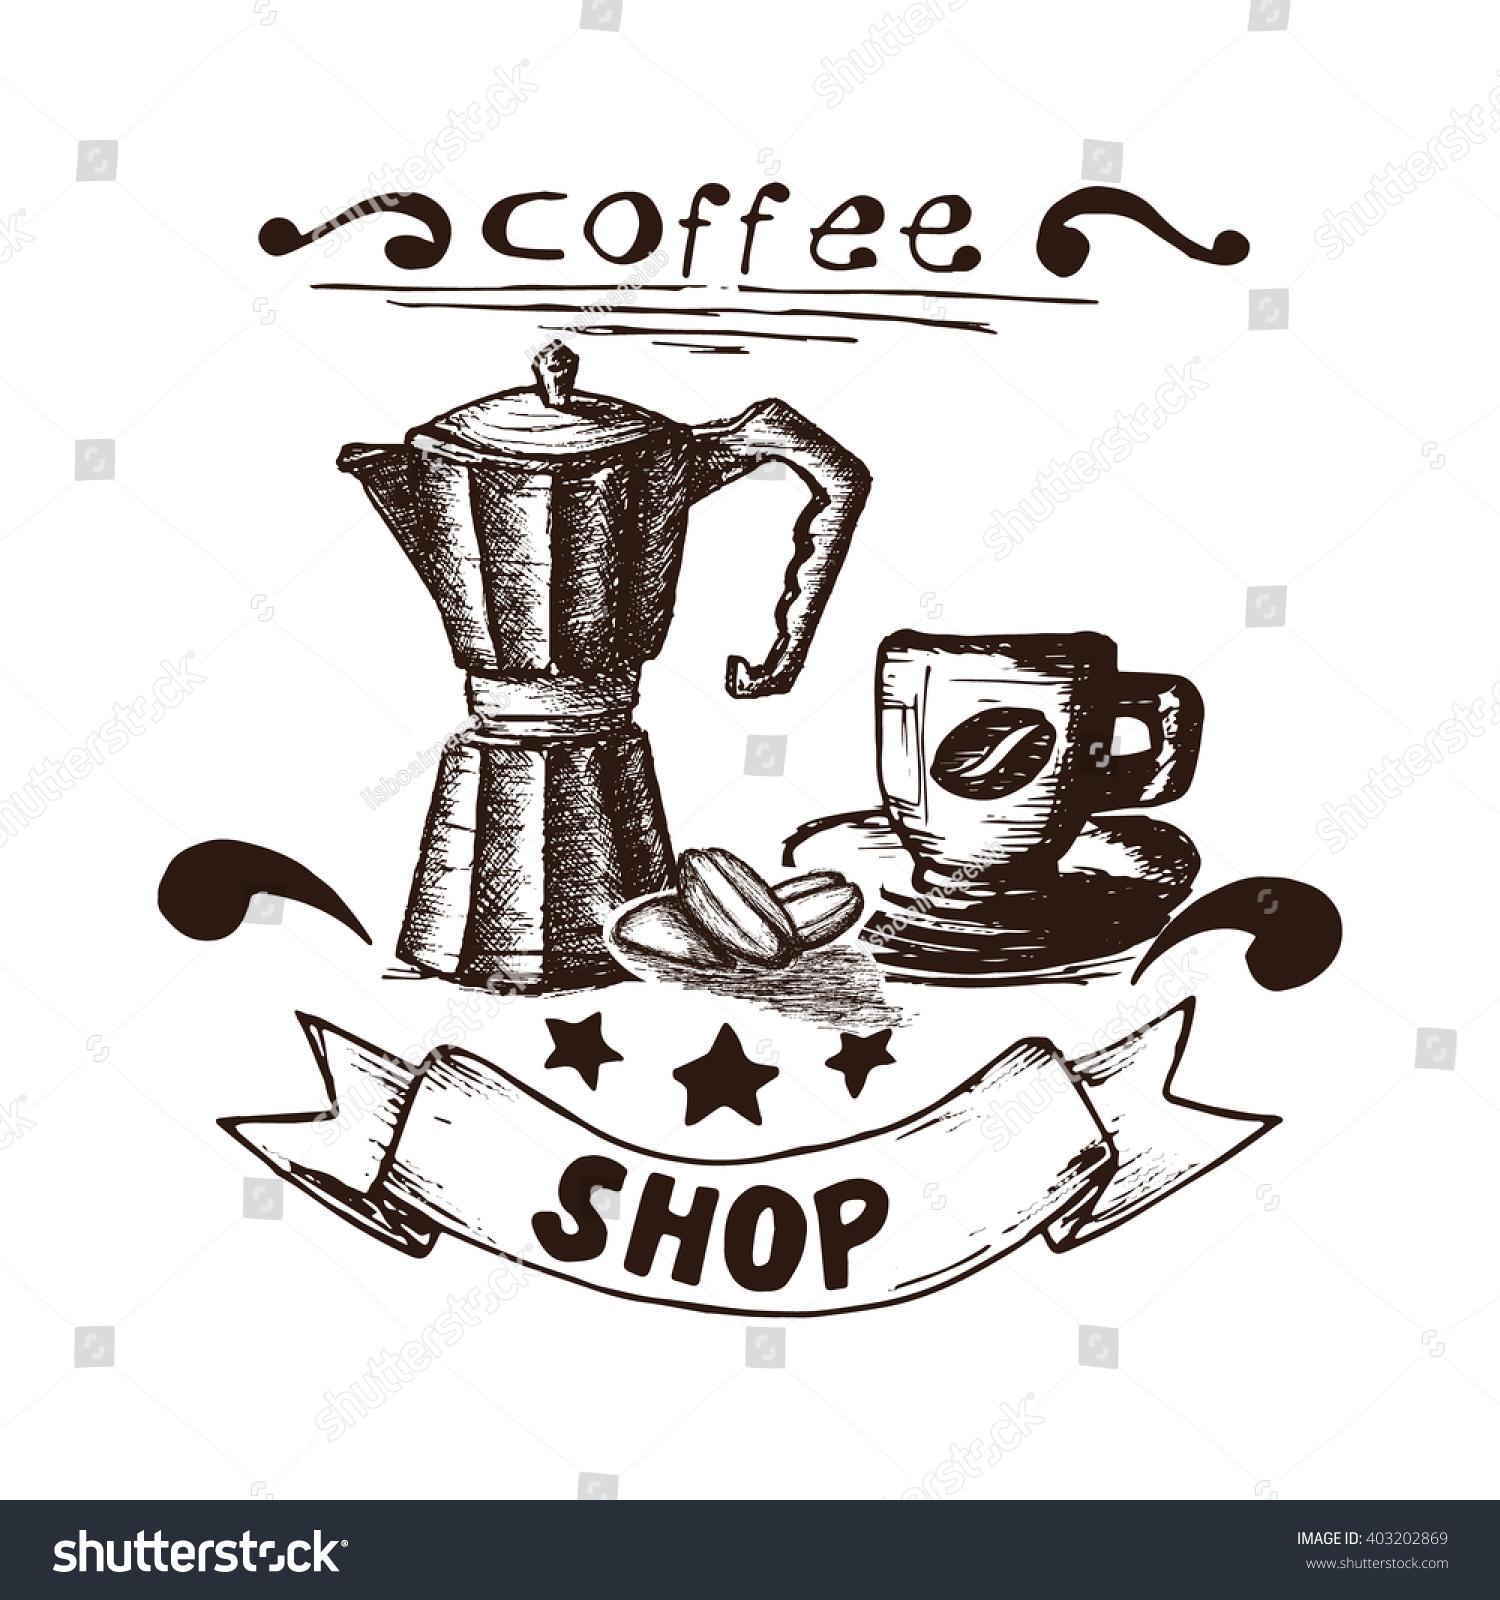 Coffee Maker Drawing ~ Hand drawn coffee espresso maker stock vector